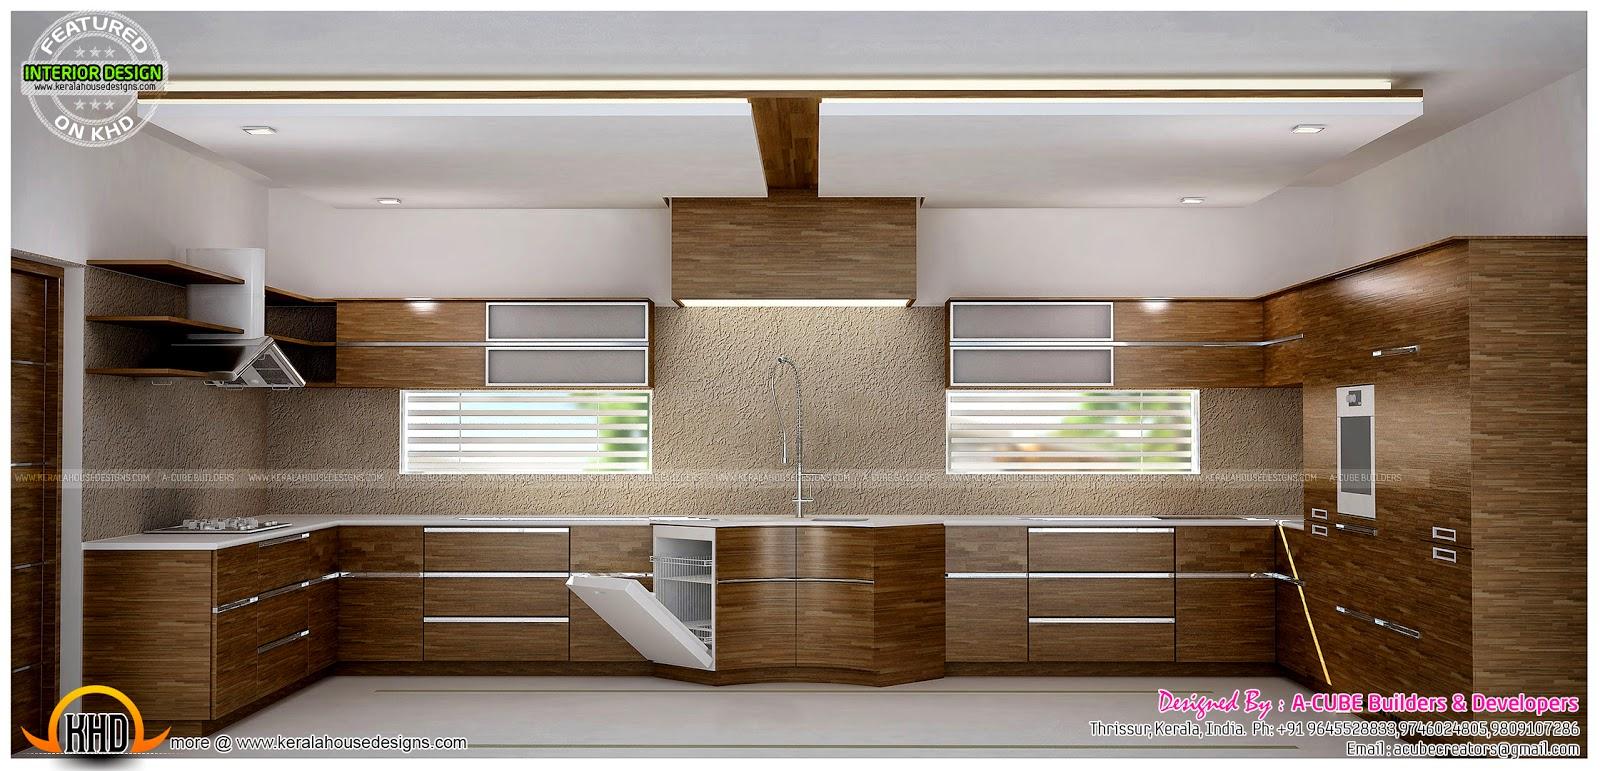 master bedrooms and kitchen interior kerala home design and floor plans. Black Bedroom Furniture Sets. Home Design Ideas